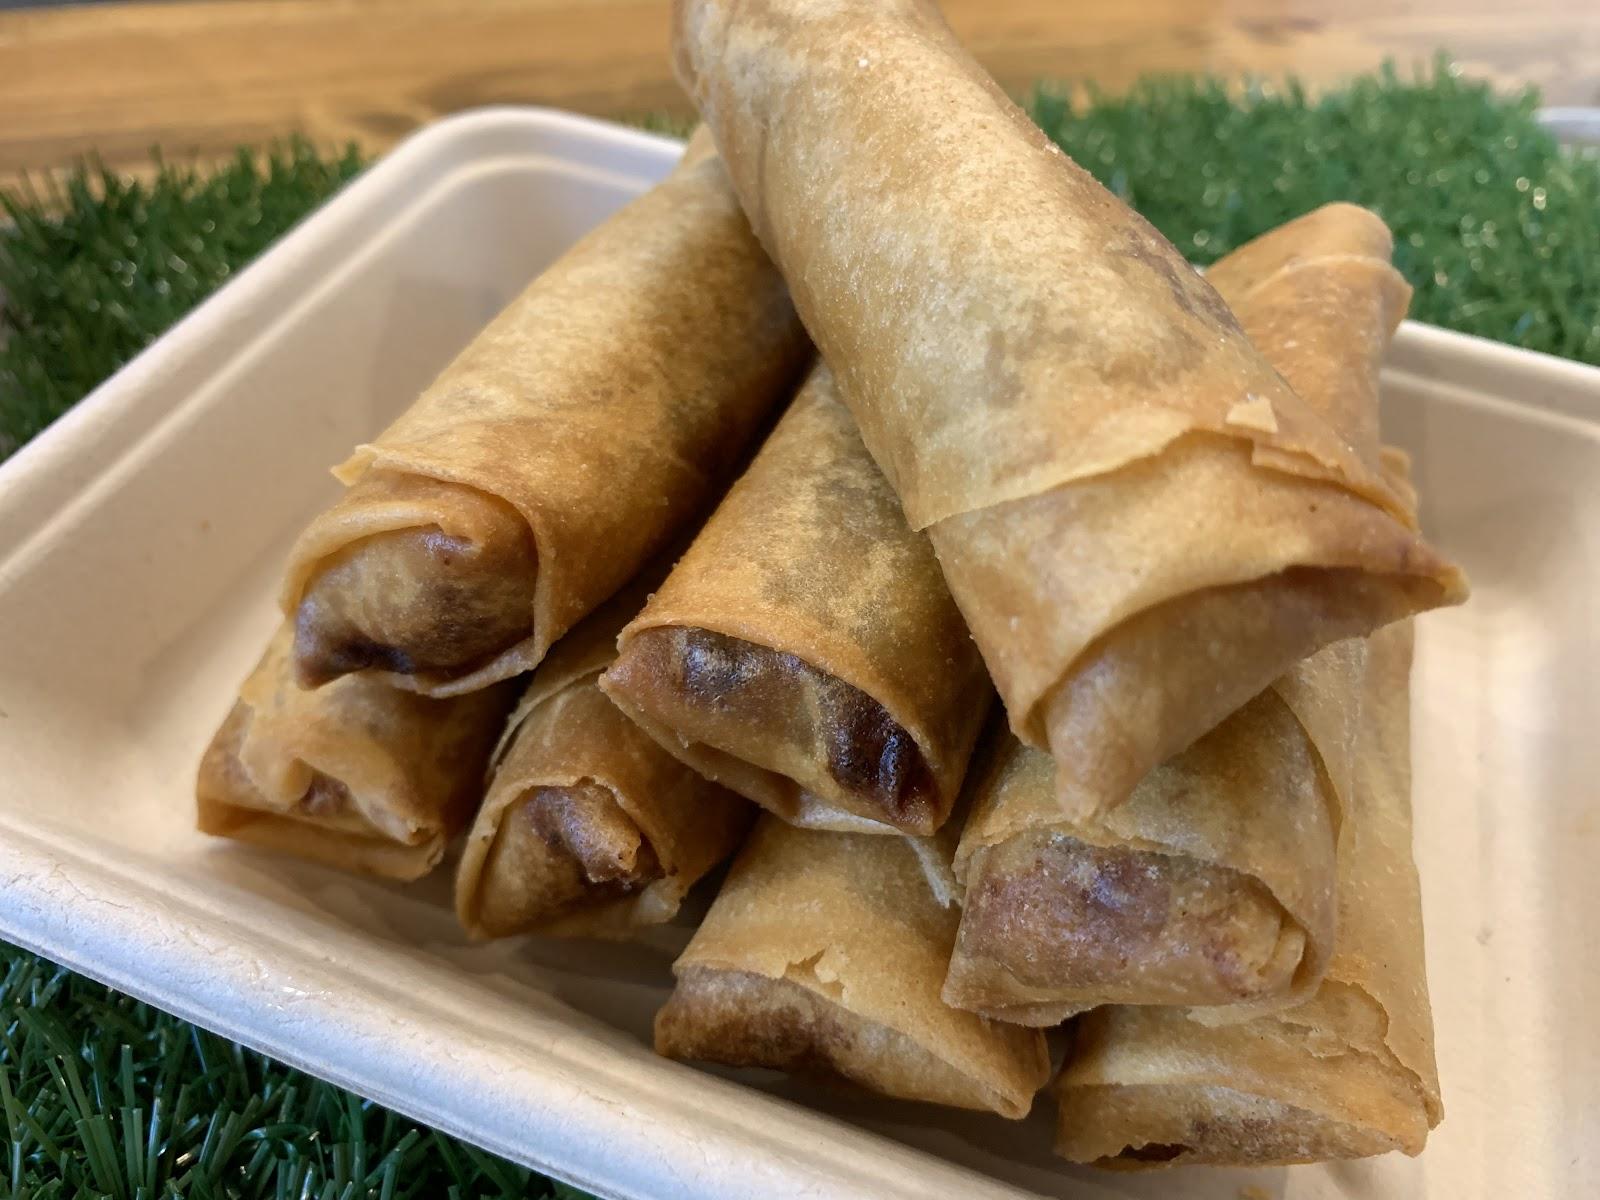 Travel Series: Pflugerville Texas Foodie. Pflugerville Pfoodie #PflugervillePfoodies #foodie #traveltexas #texasblogger #vietnamesefood #bahnmi #freshfood #tru #smalltown #smalltowntexas #smalltownstexas #thehappymustardseed